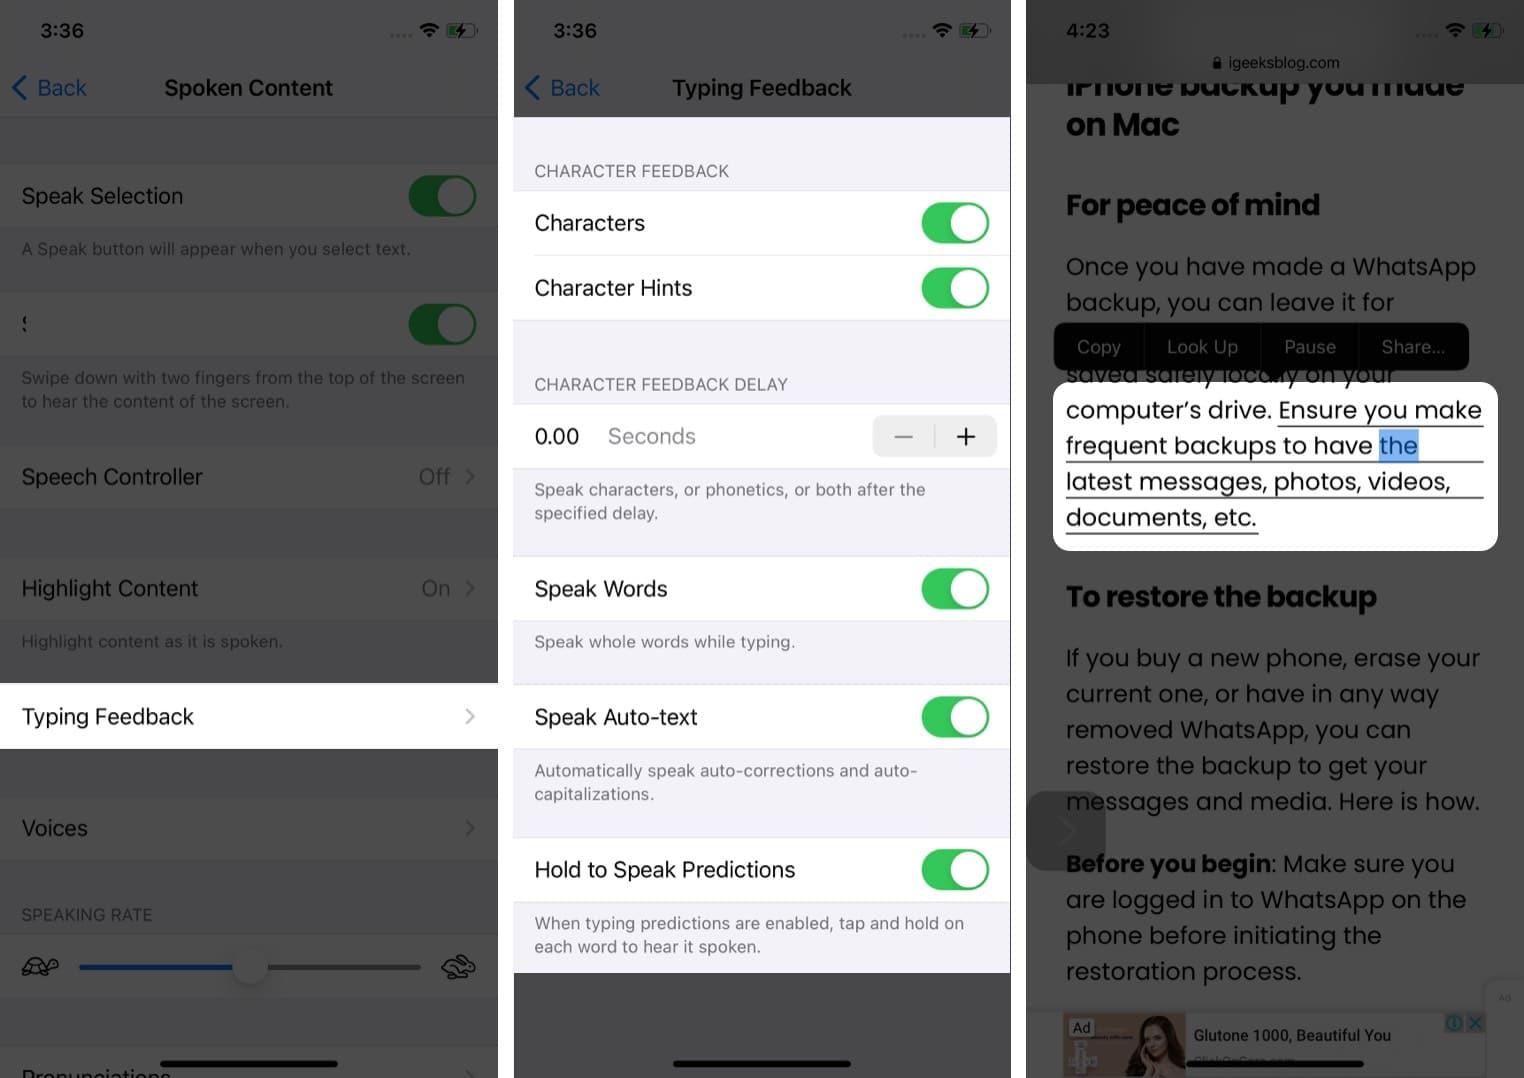 Typing Feedback to make Siri speak on iPhone